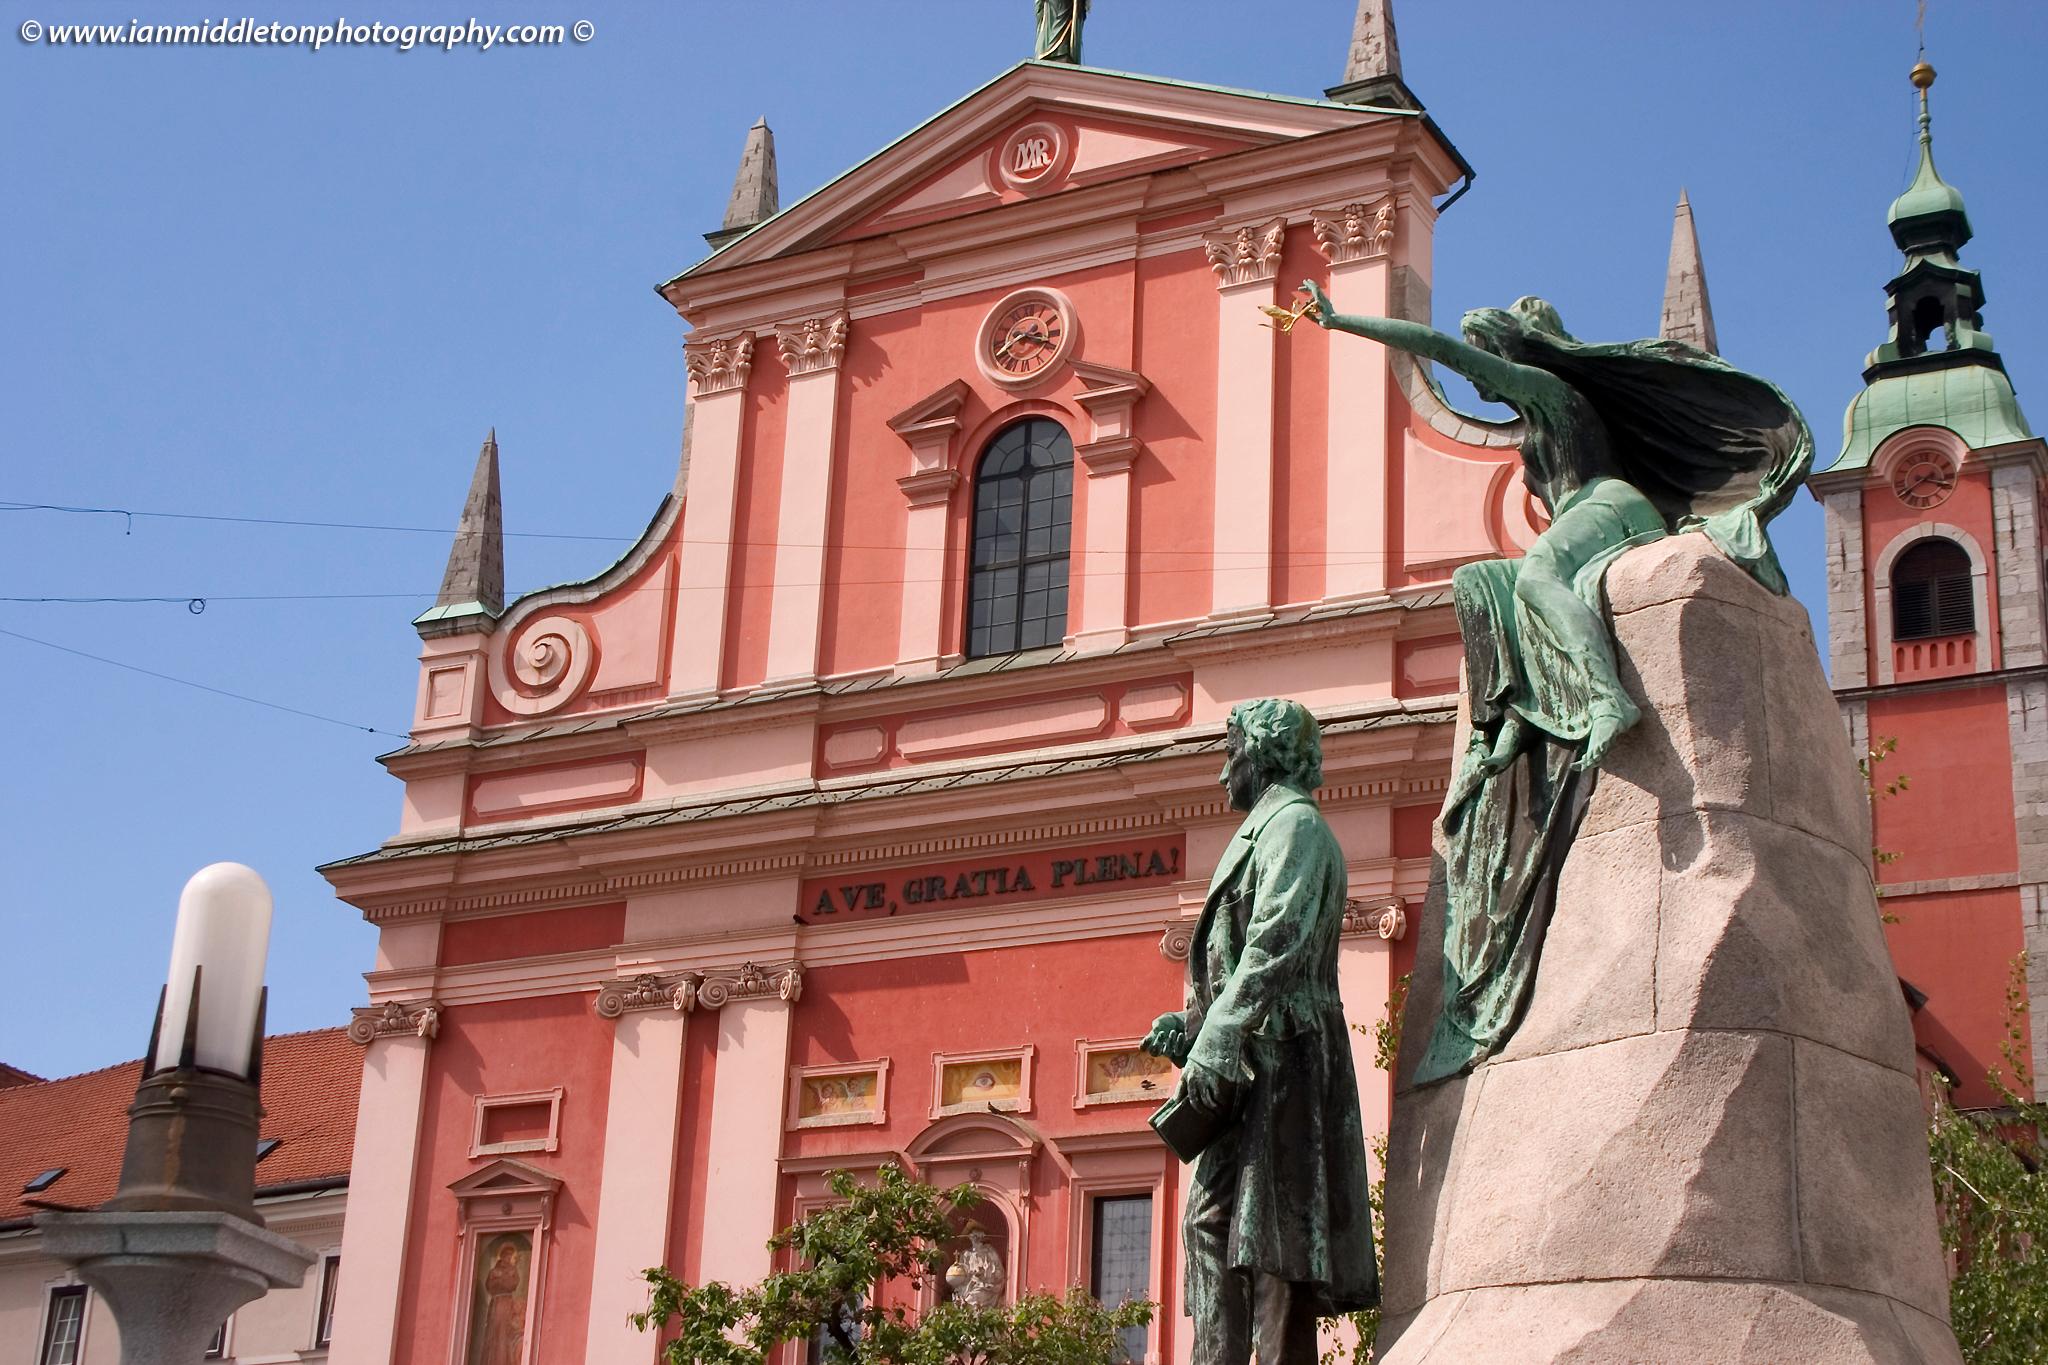 Preseren Square in Ljubljana, Slovenia. The beautiful Franciscan church and Preseren statue.